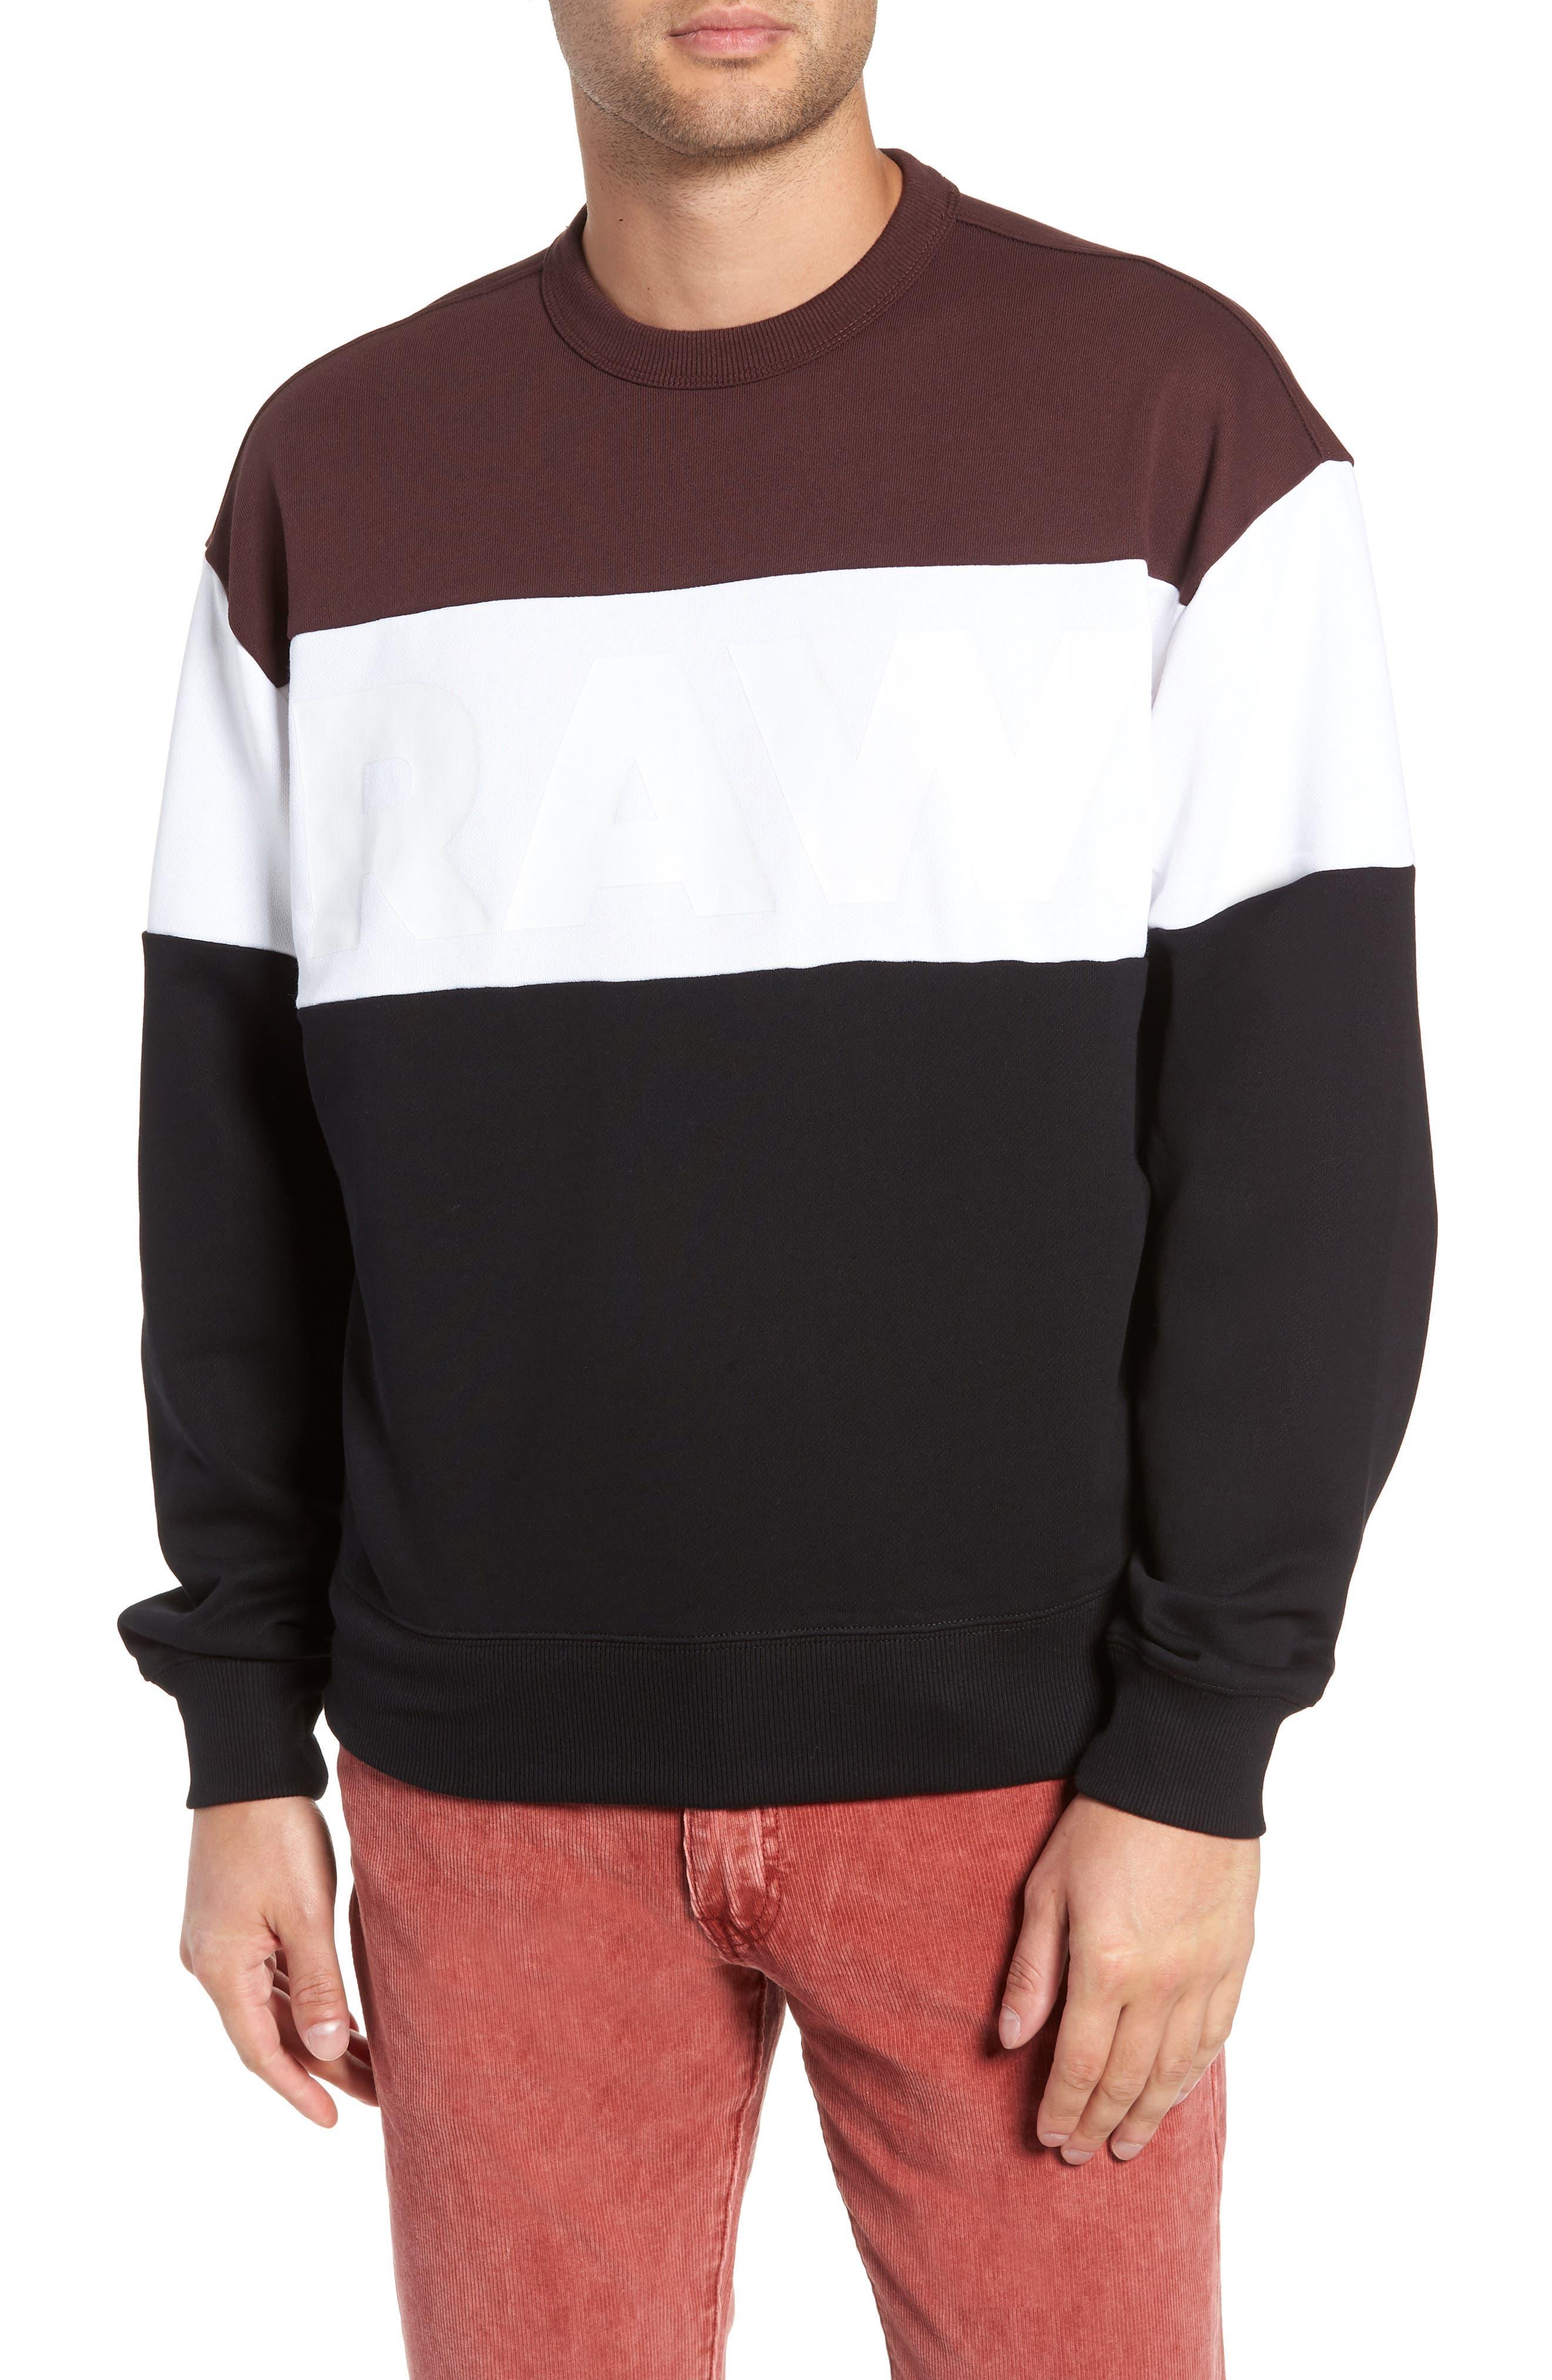 Libe Core Colorblock Sweatshirt,                             Main thumbnail 1, color,                             001